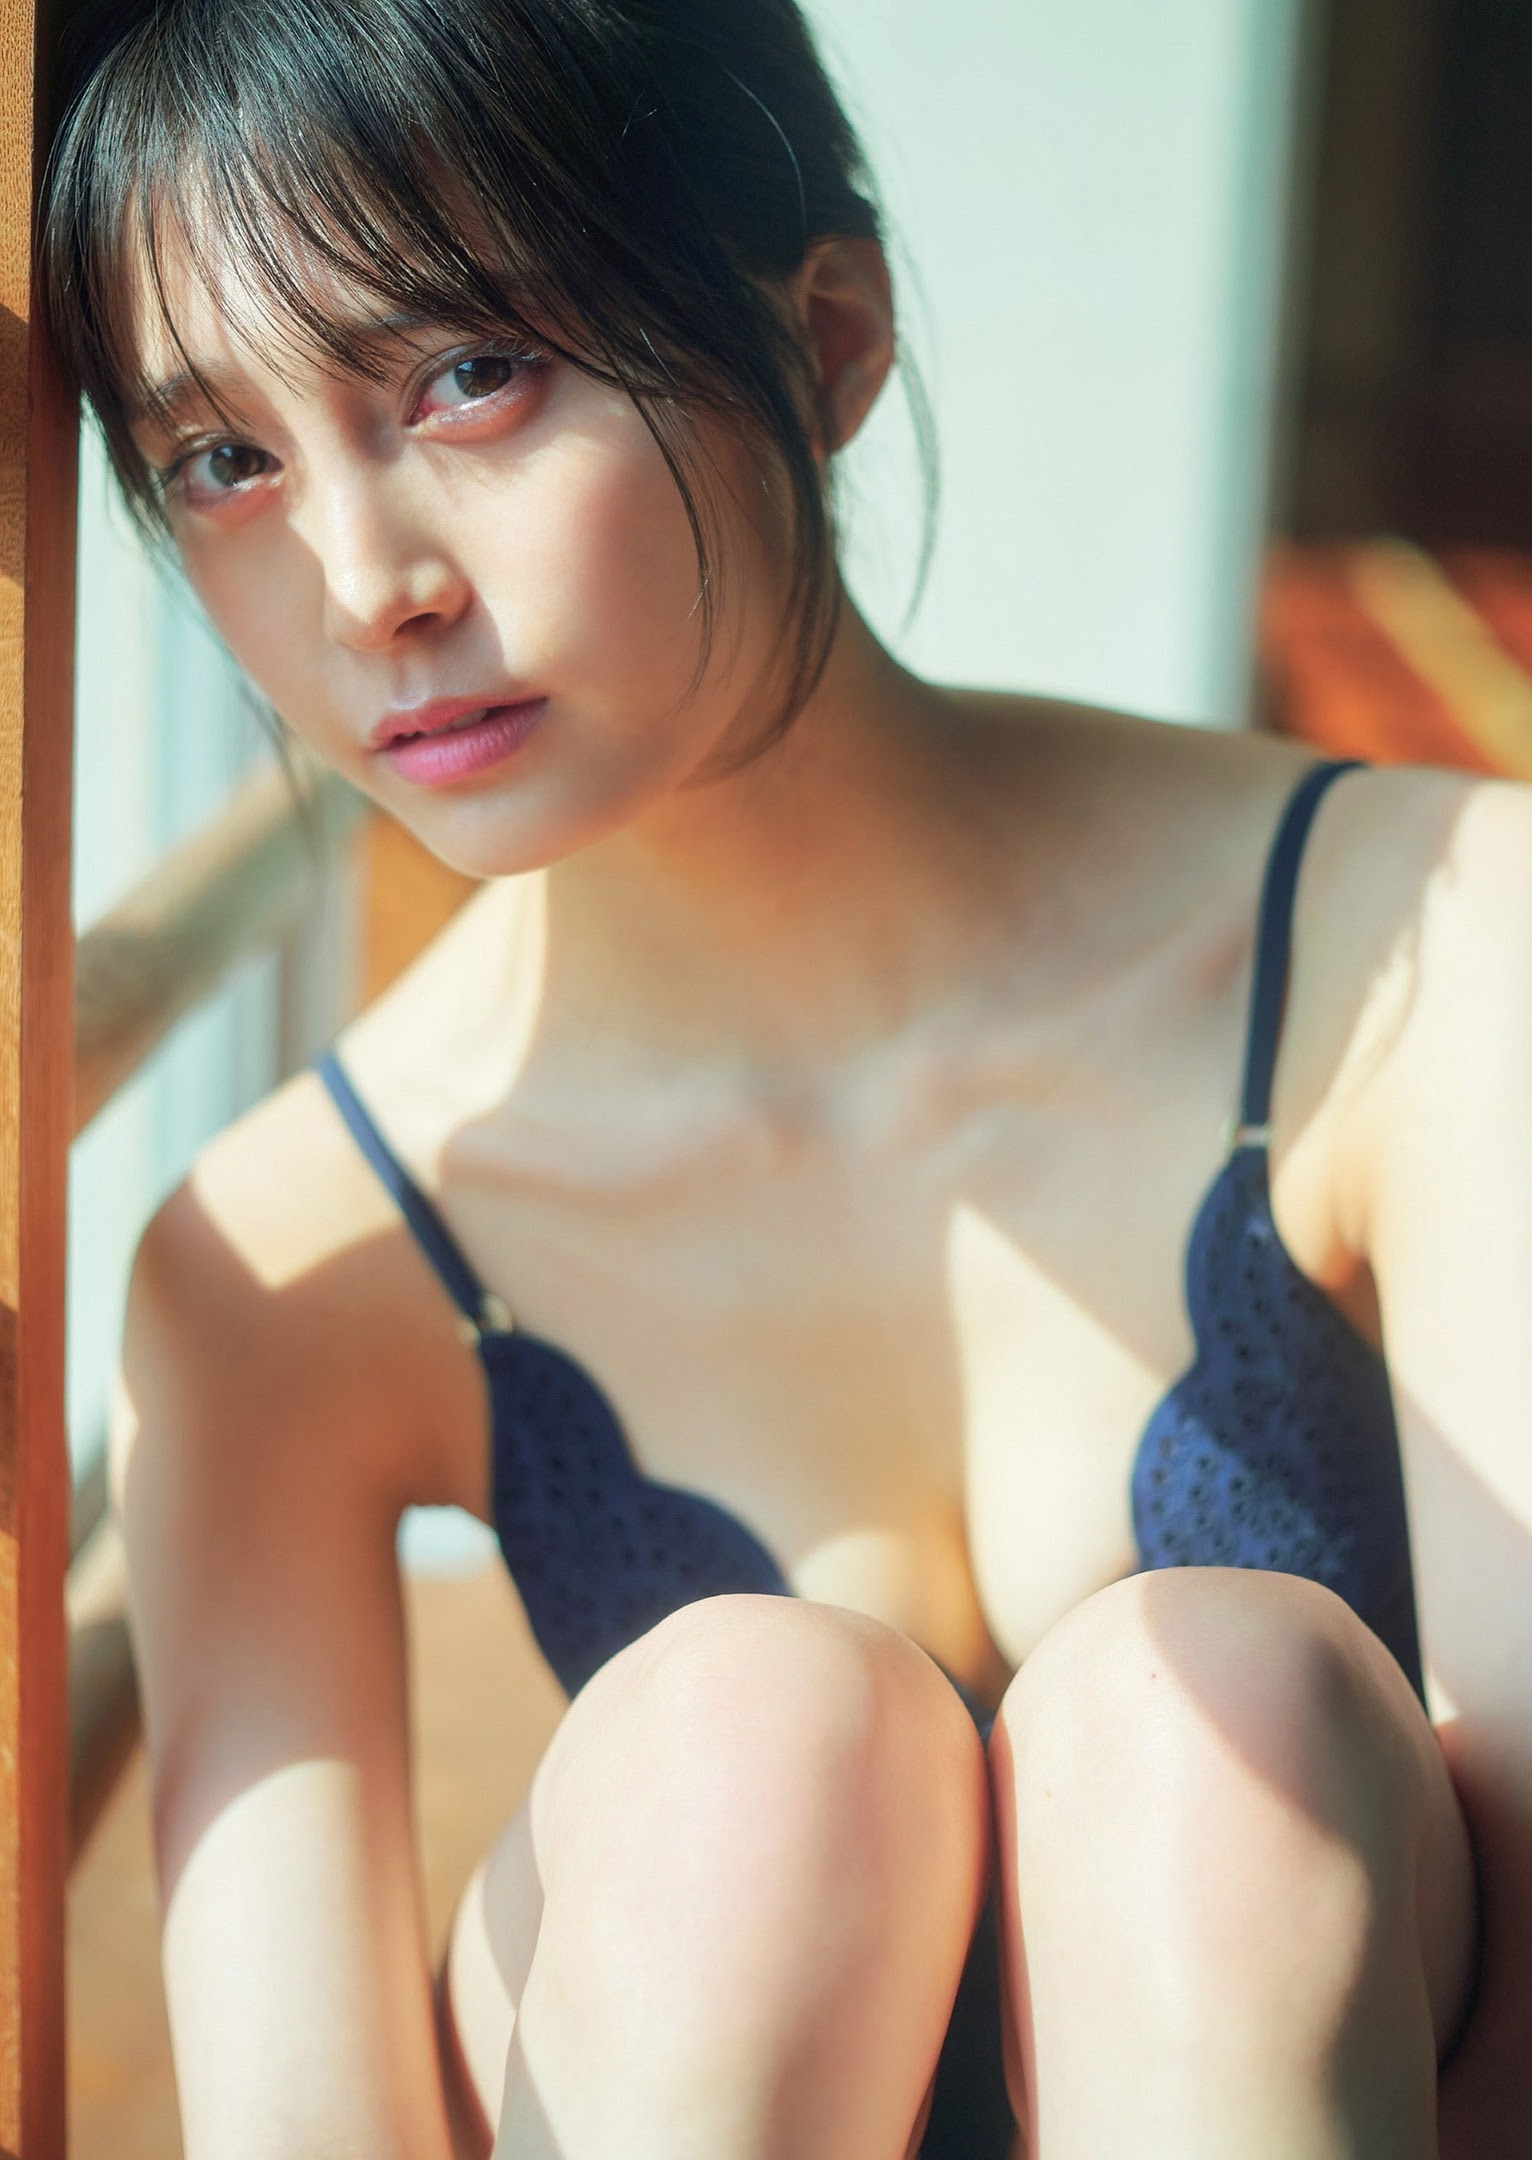 小山璃奈 頓知気さきな 伊藤美来-Weekly Playboy 2021年第十八期 高清套图 第9张